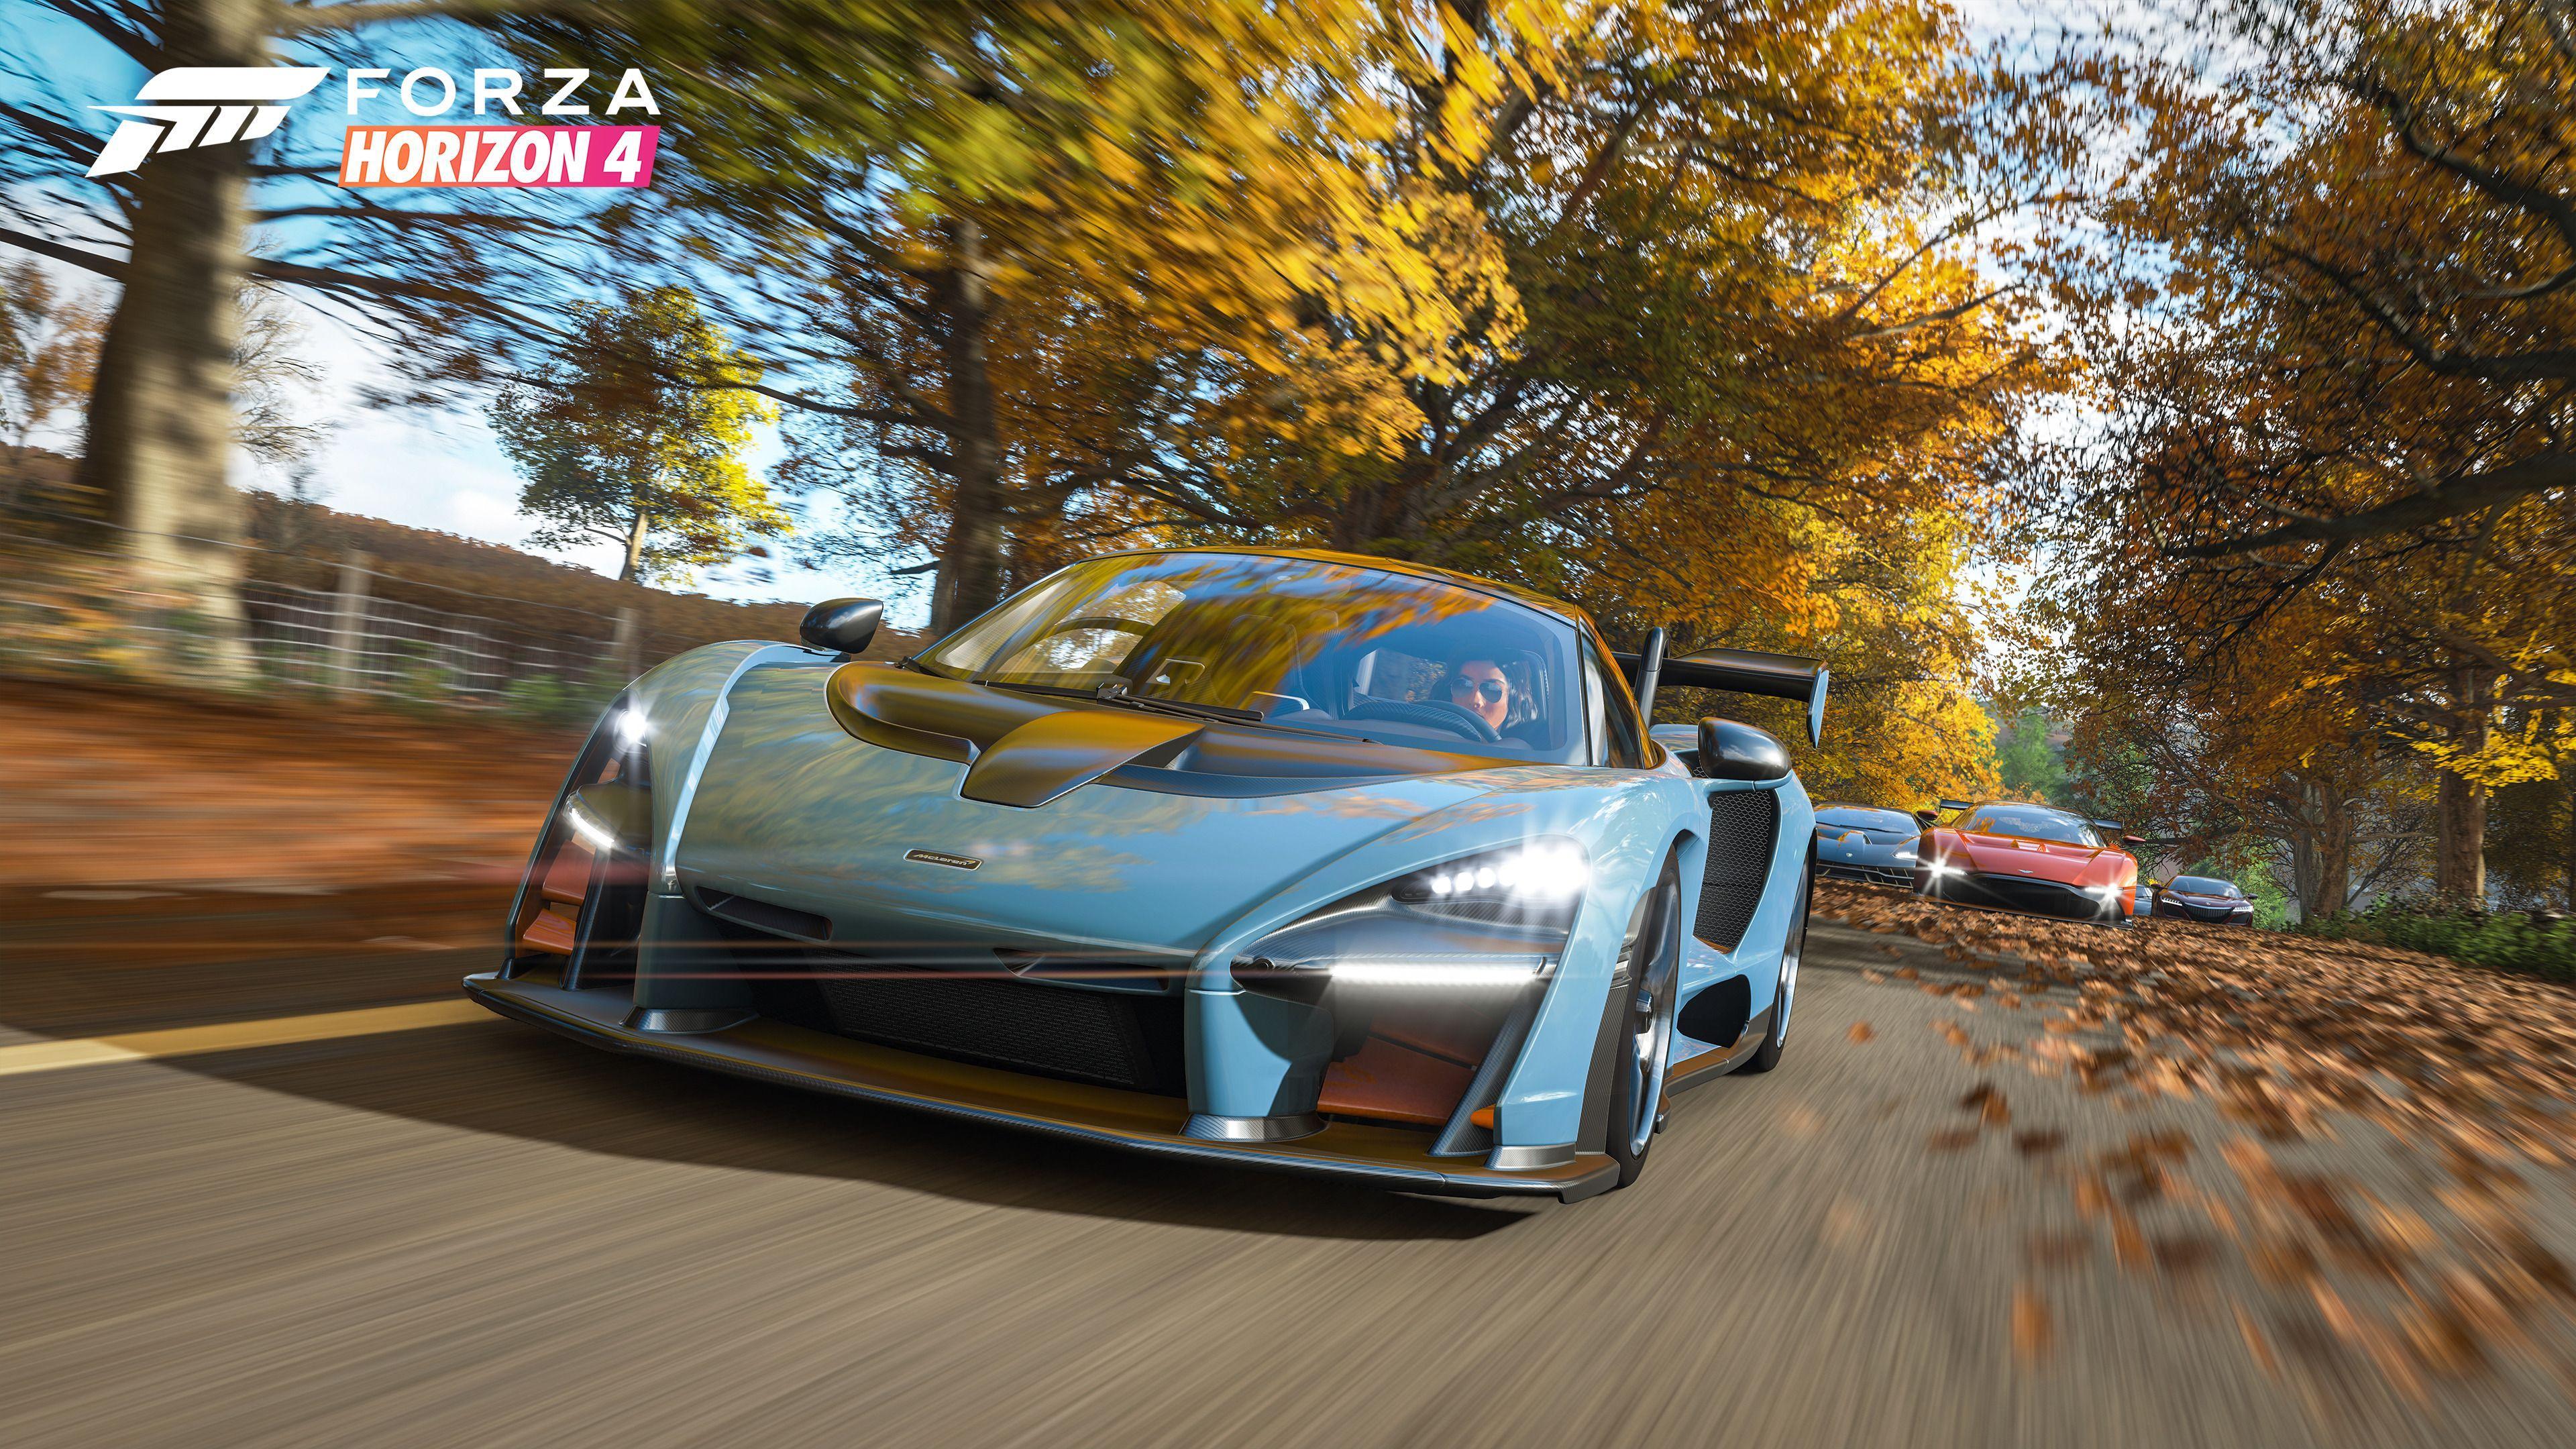 3840x2160 Forza Horizon 4 2018, HD Games, 4k Wallpaper, Image